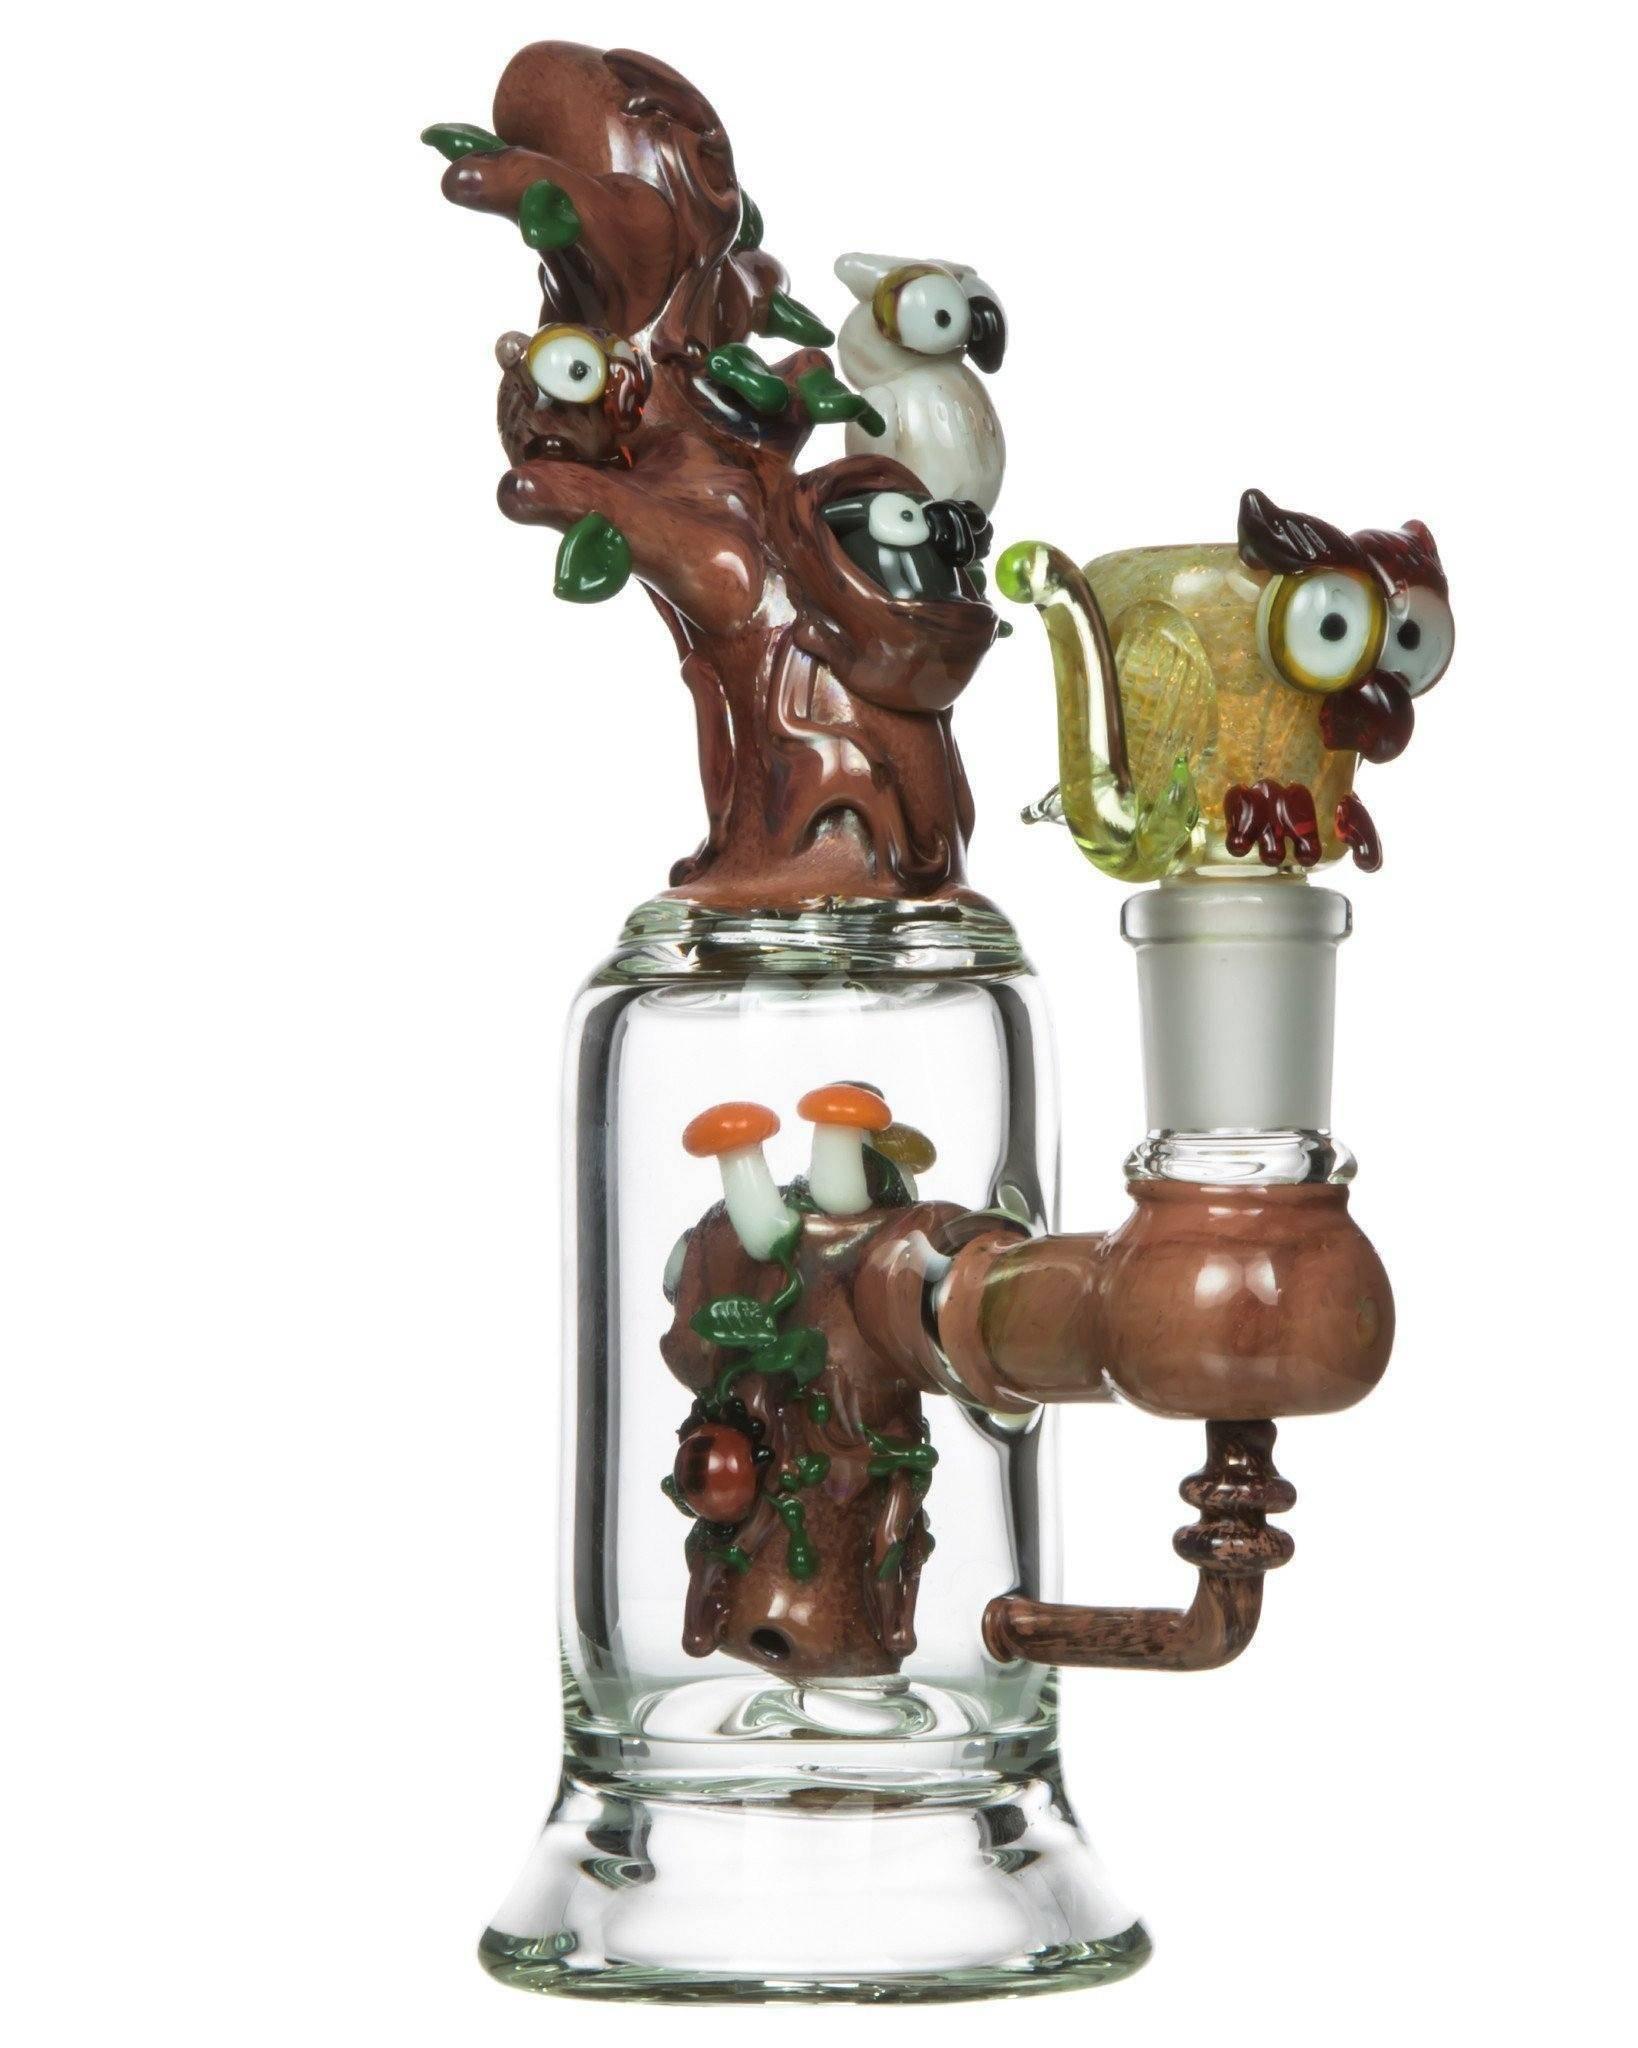 Empire Glassworks Hootie Owl & Mushroom Bong - DopeBoo